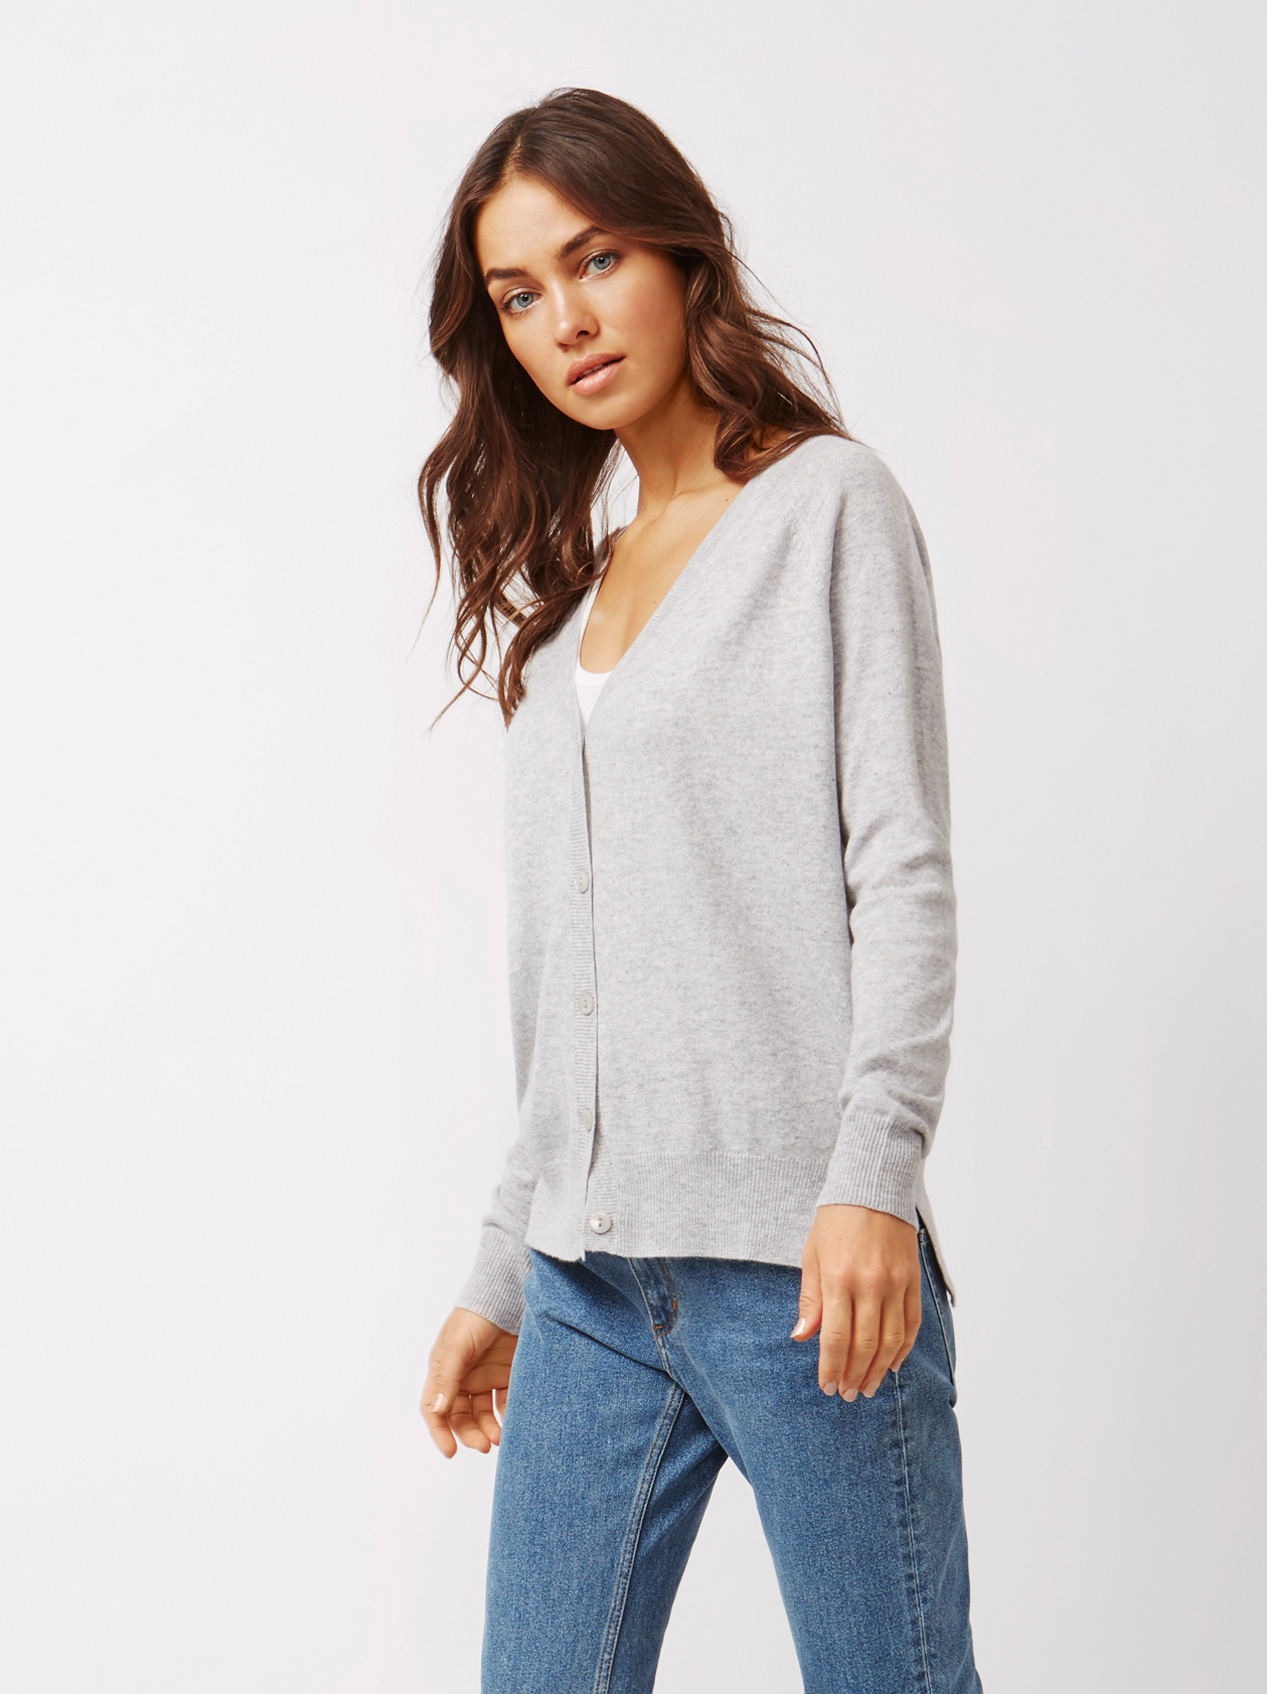 Soft Goat Women's V-Neck Cardigan Light Grey